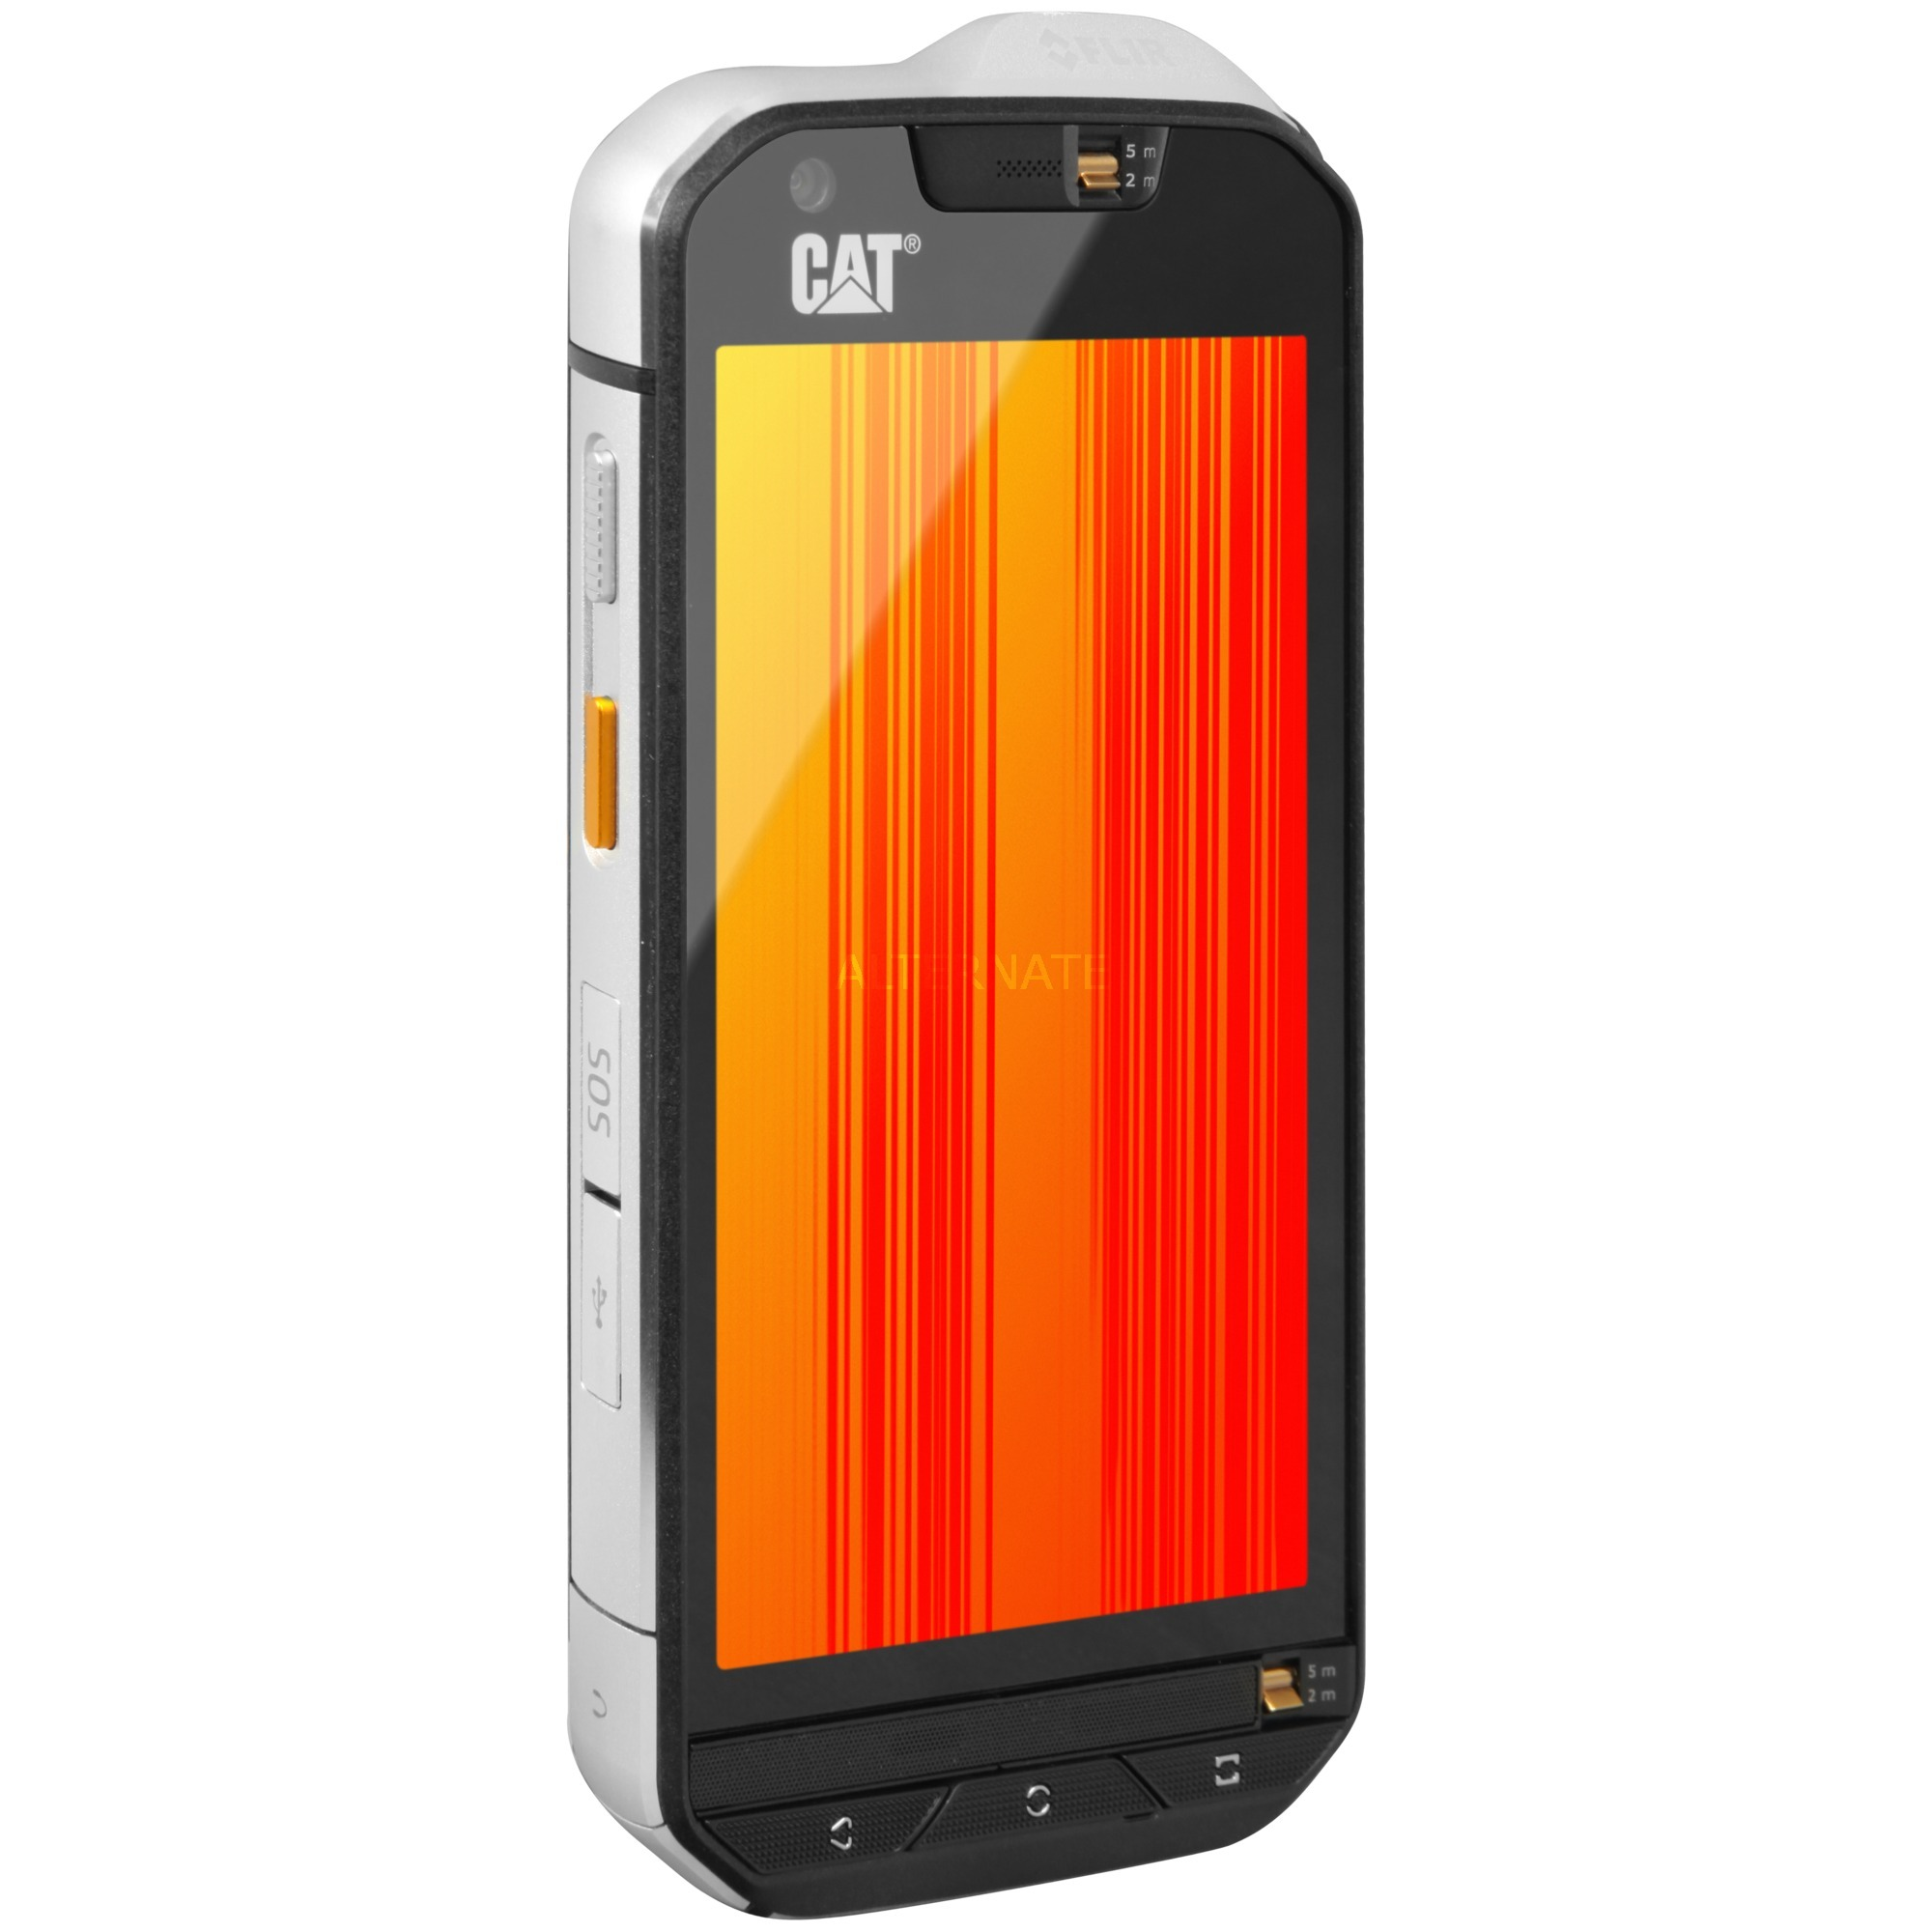 cs60-deb-eur-en-mobiltelefon